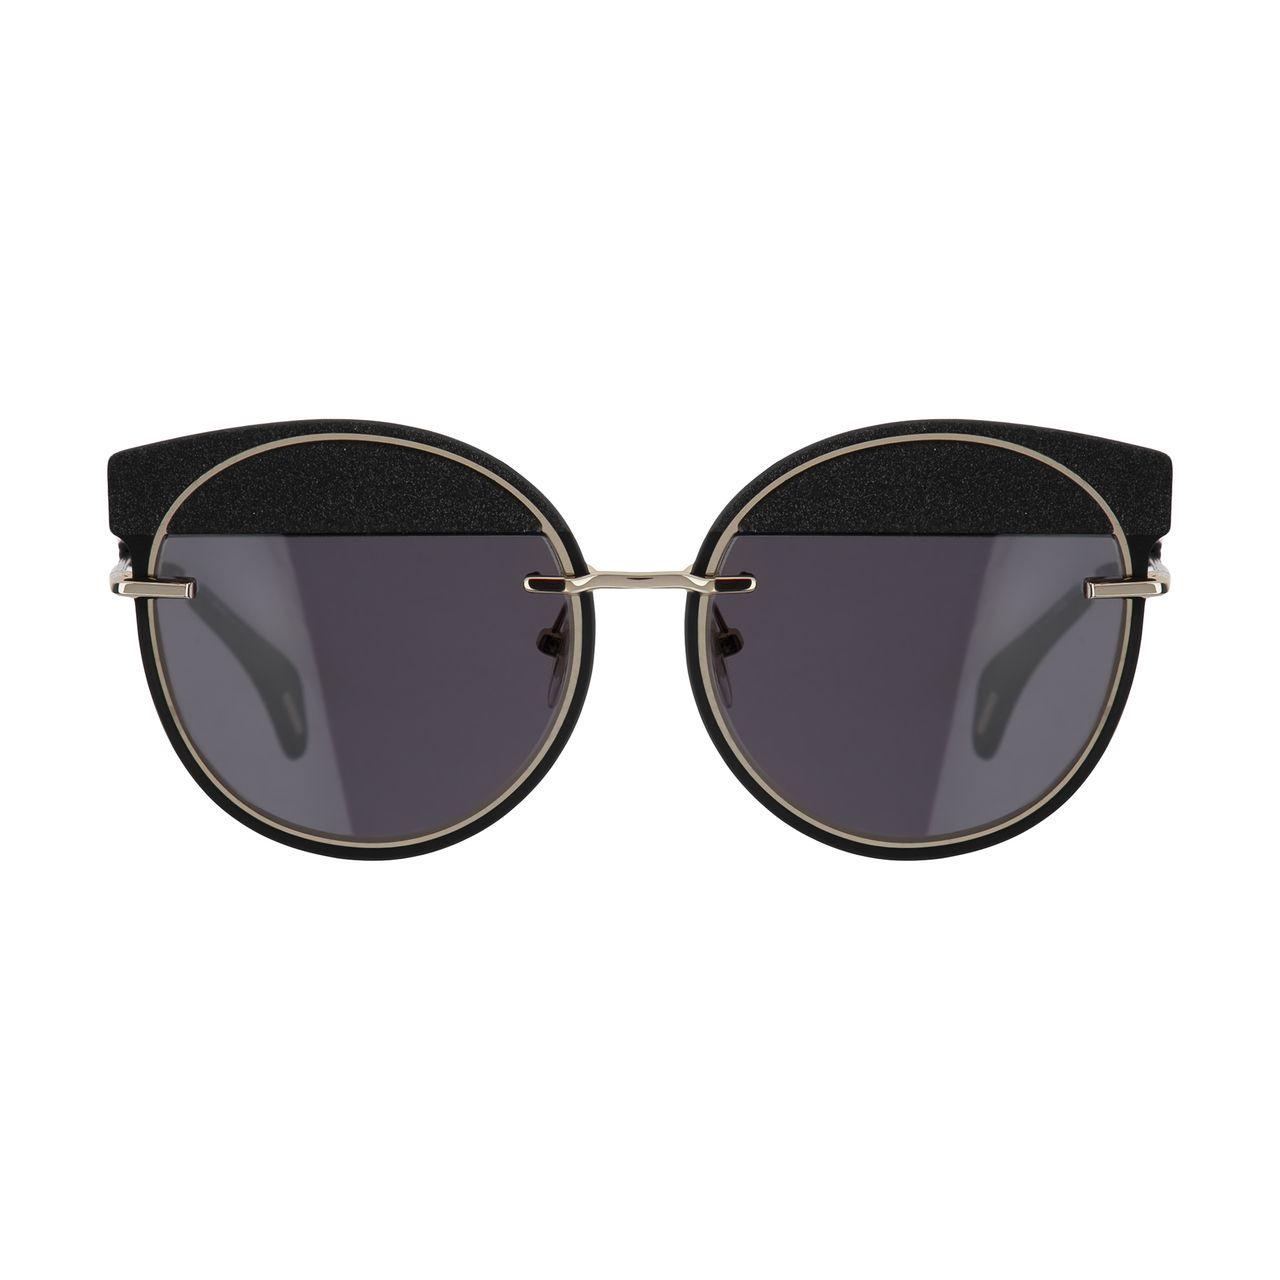 عینک آفتابی زنانه پلیس مدل SPL833 0300